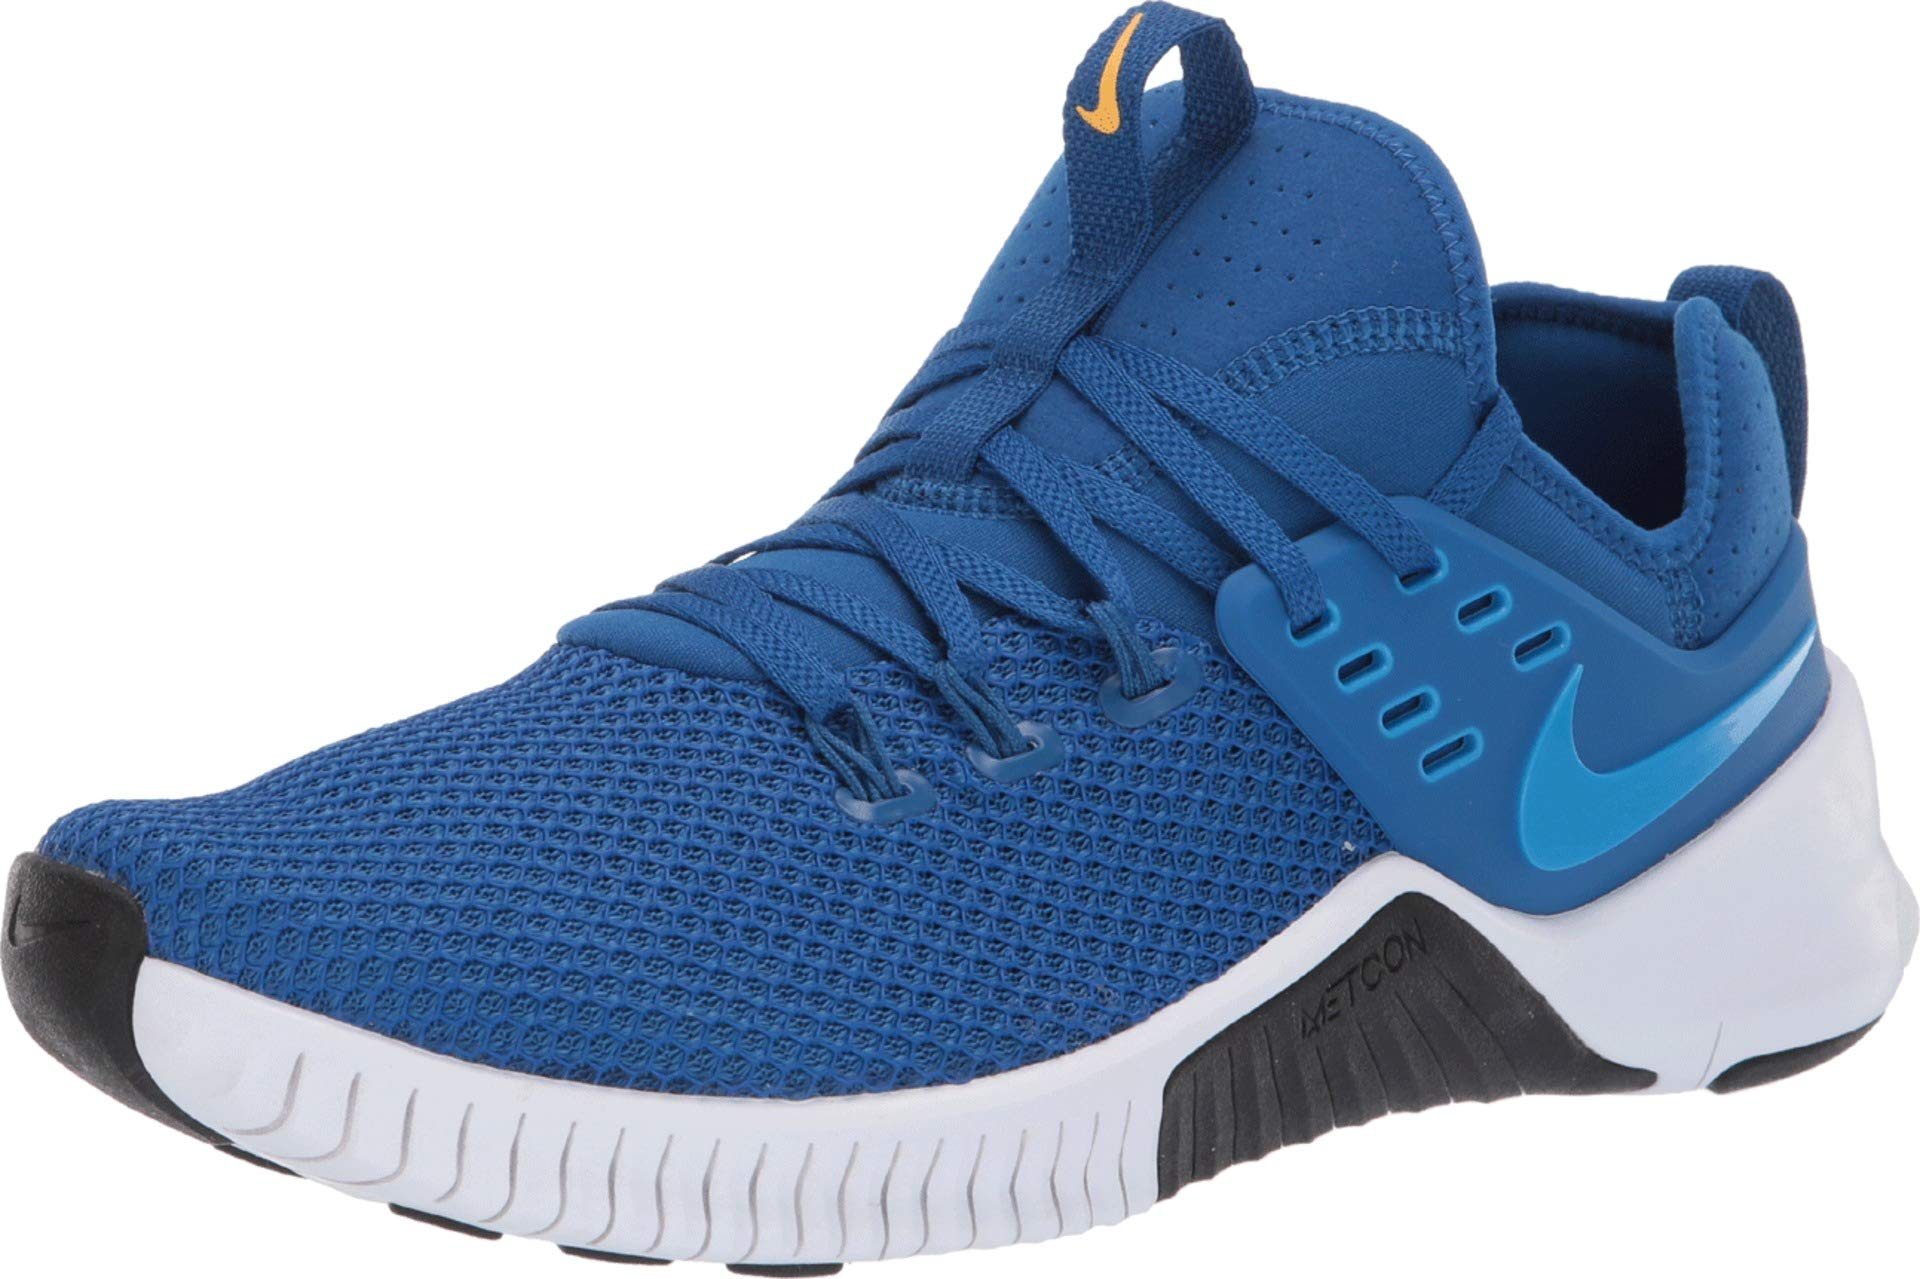 Nike Men's Metcon Free Training Shoe Team Royal/Amarillo-LT Photo Blue 7.5